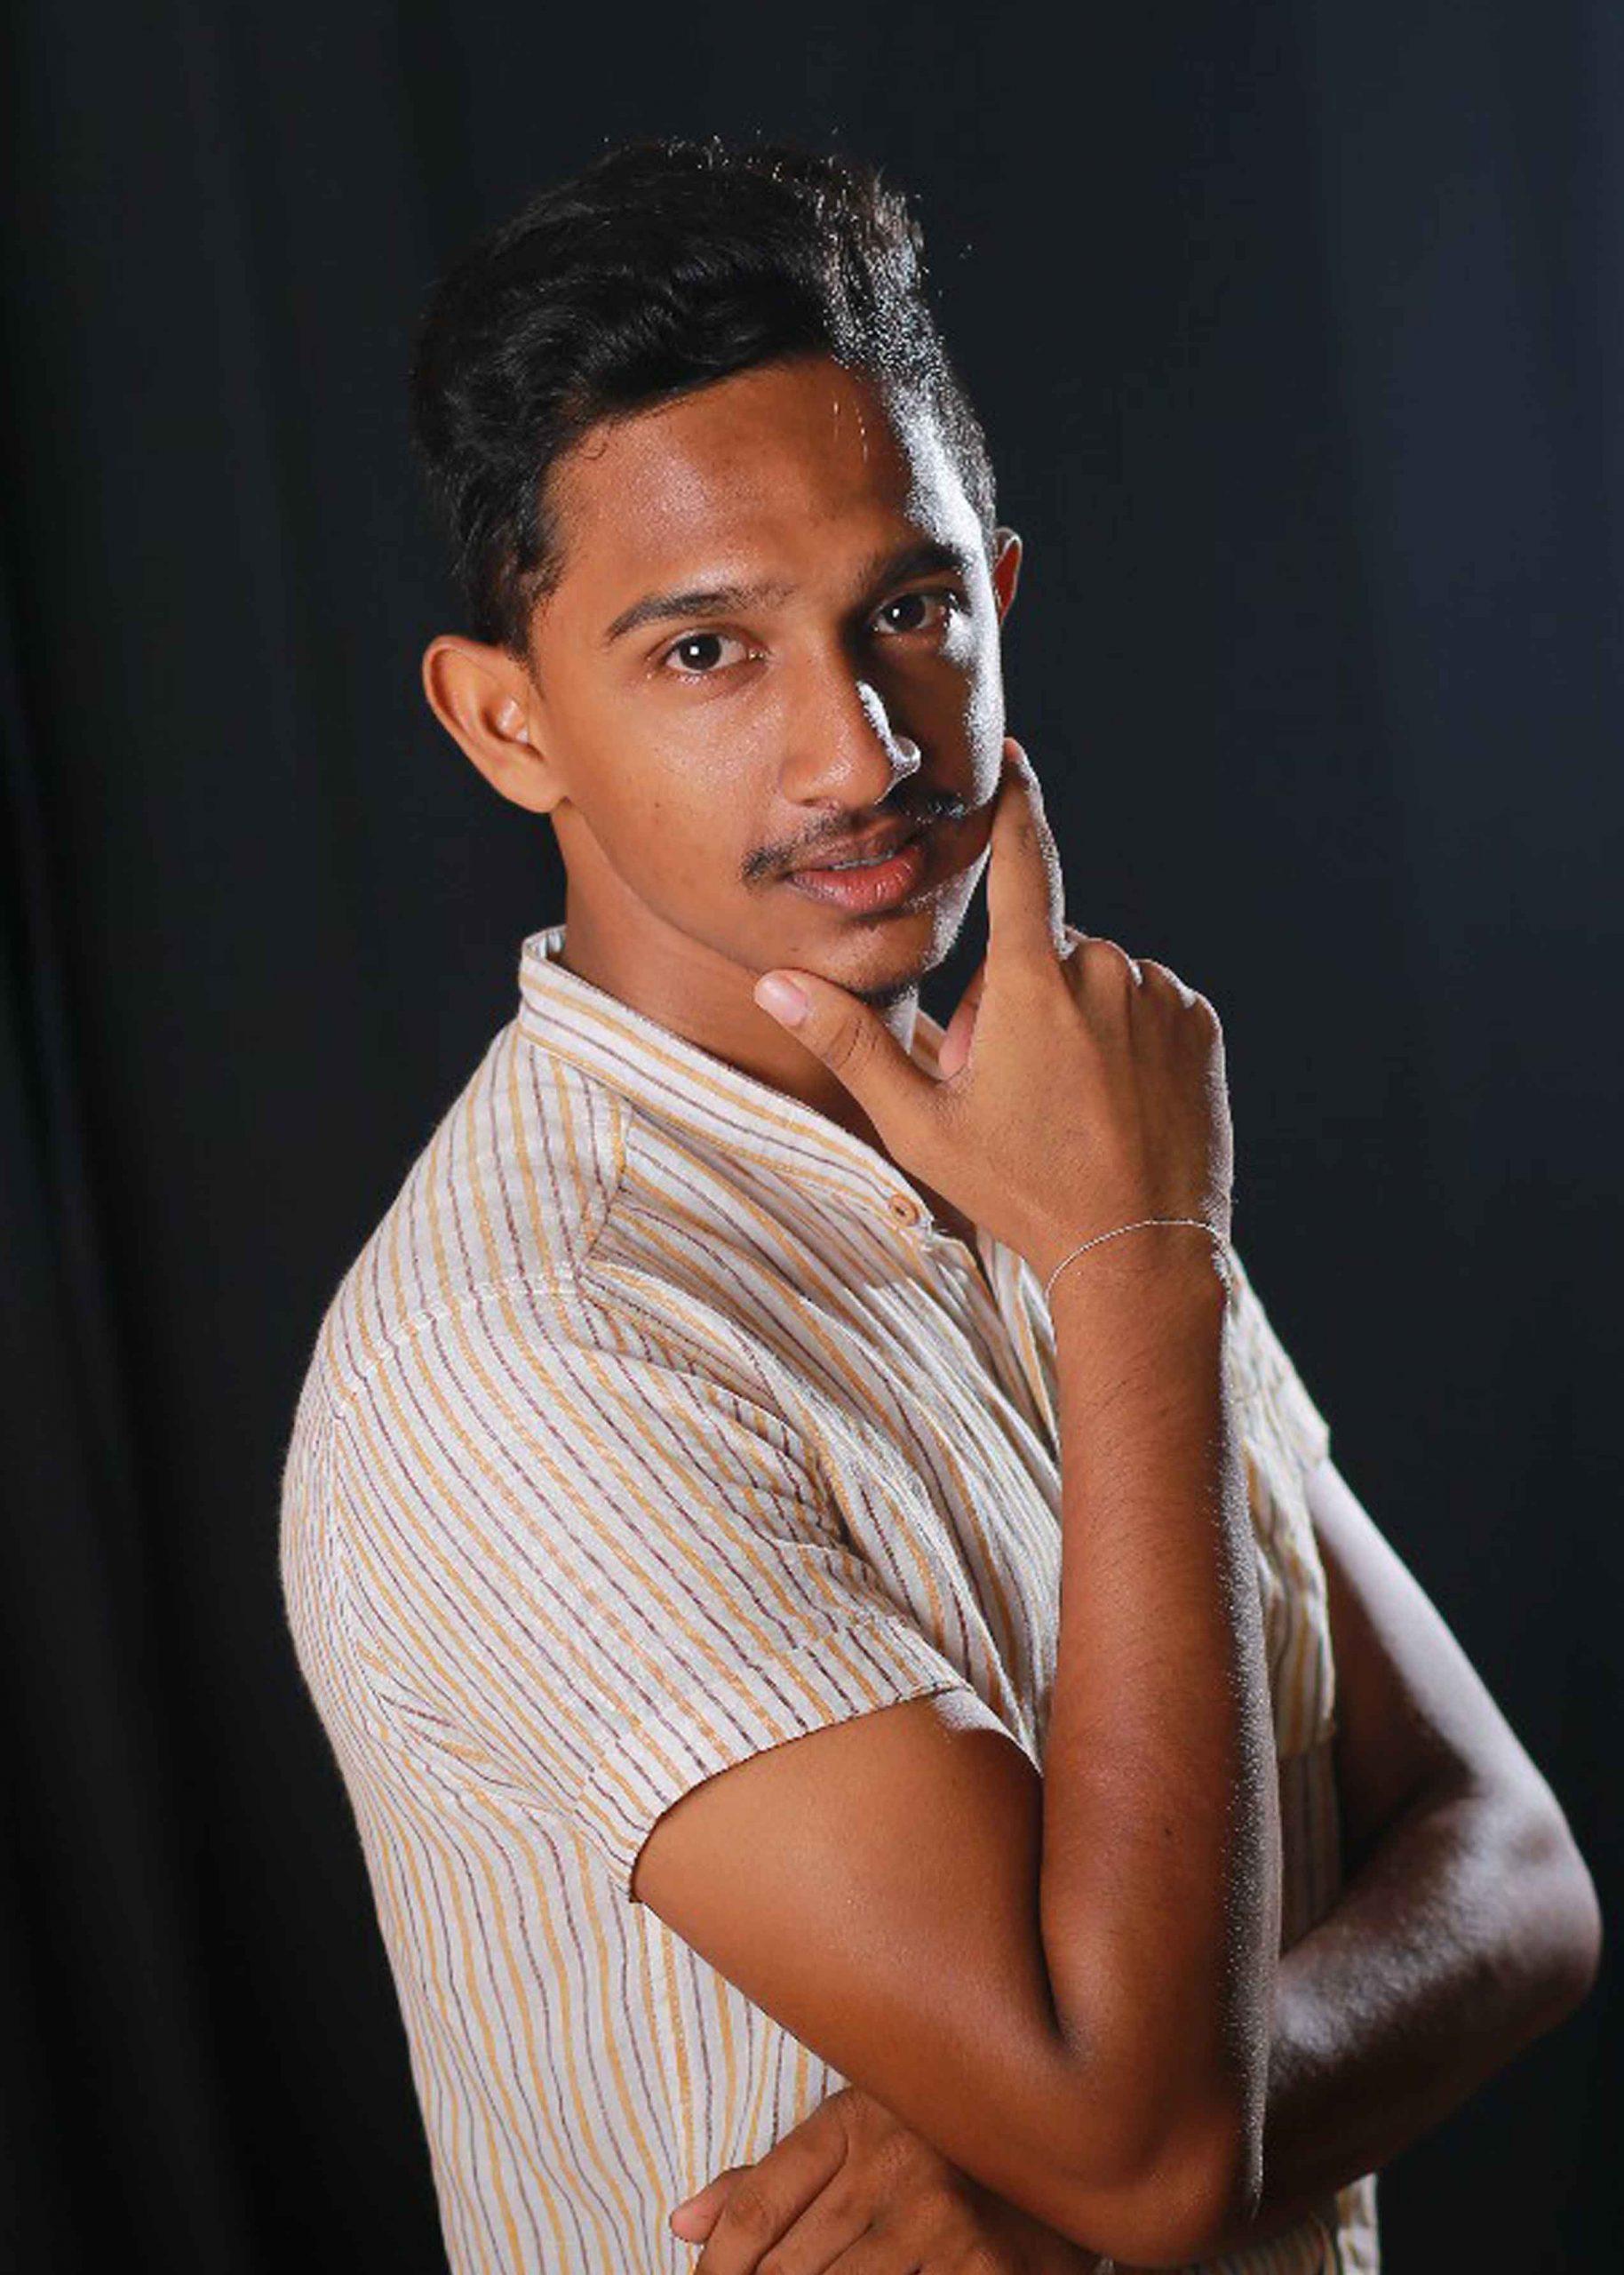 Chamith Pehesara